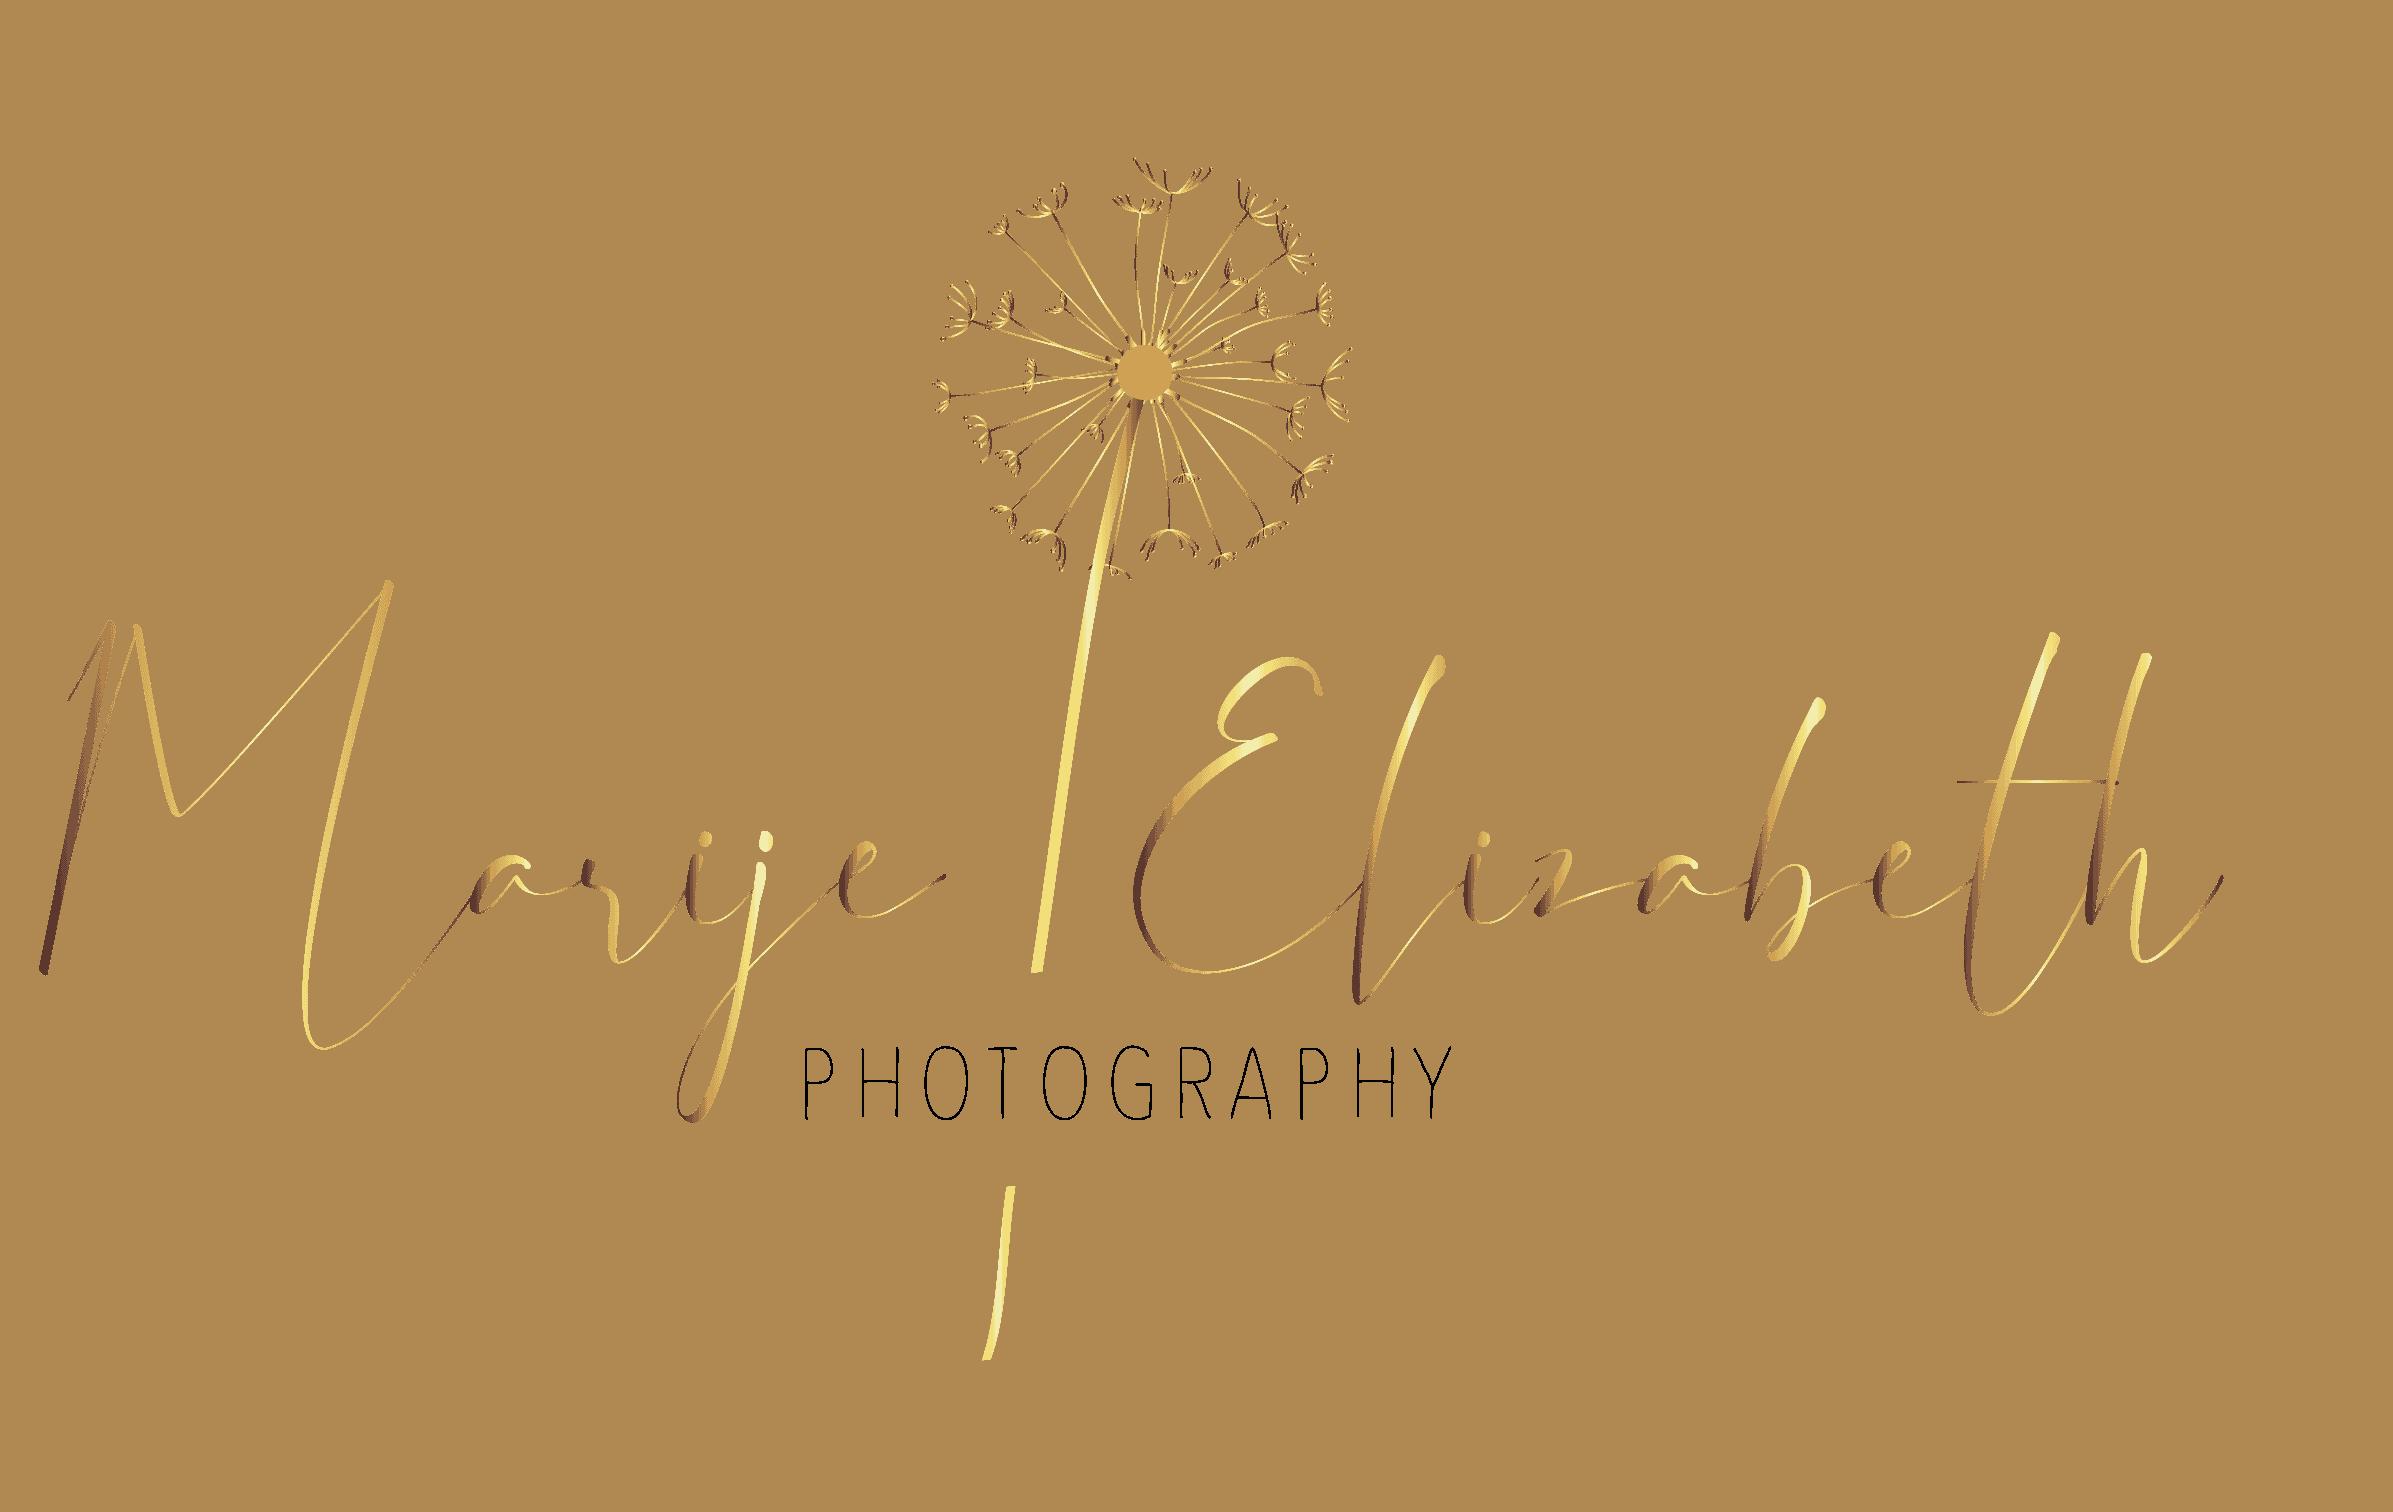 Marije Elizabeth Photography logo